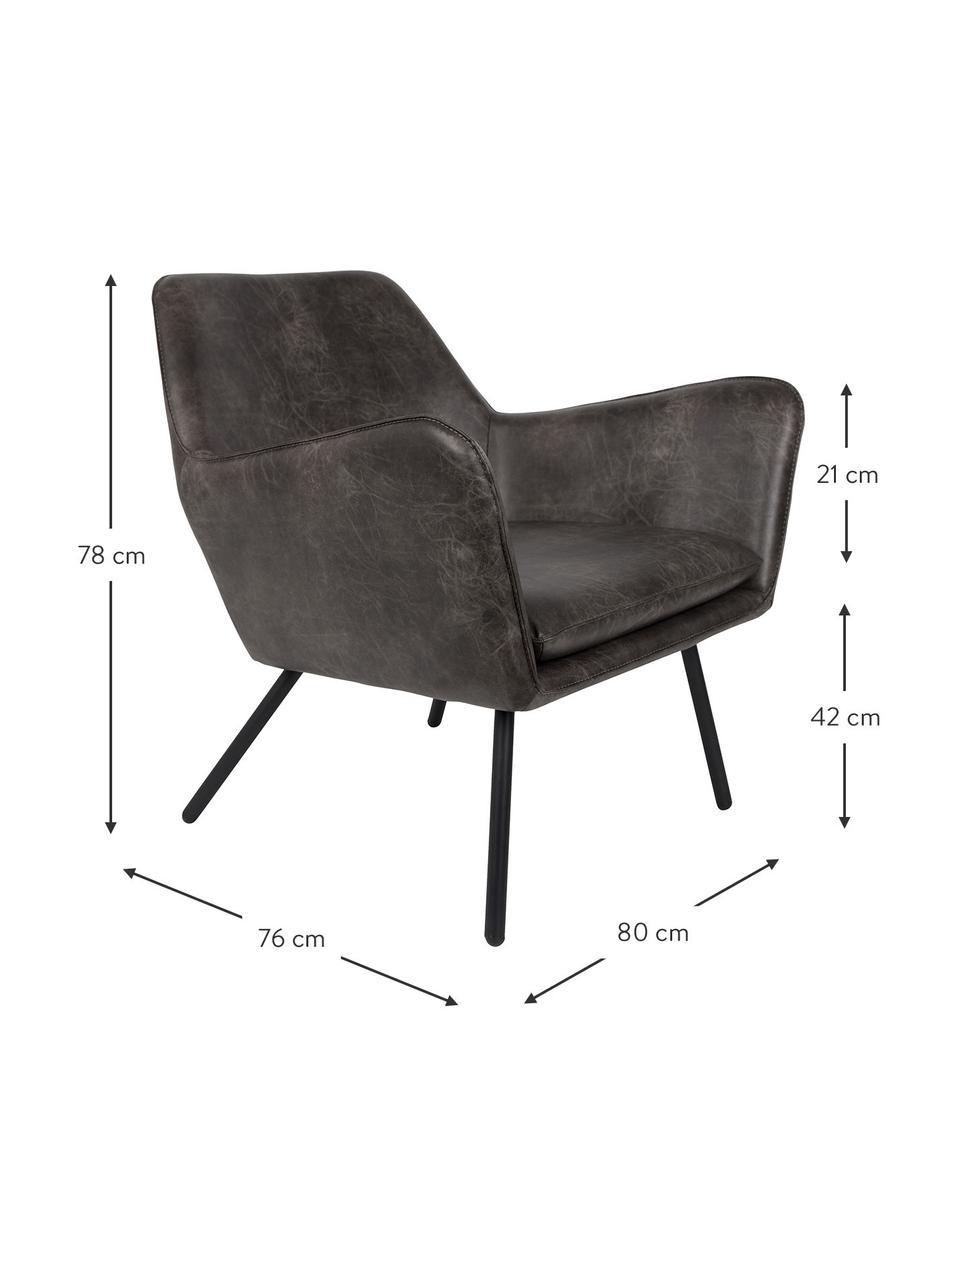 Poltrona in similpelle nero Bon, Rivestimento: similpelle (64% poliureta, Piedini: metallo verniciato, Similpelle grigio scuro, Larg. 80 x Alt. 76 cm